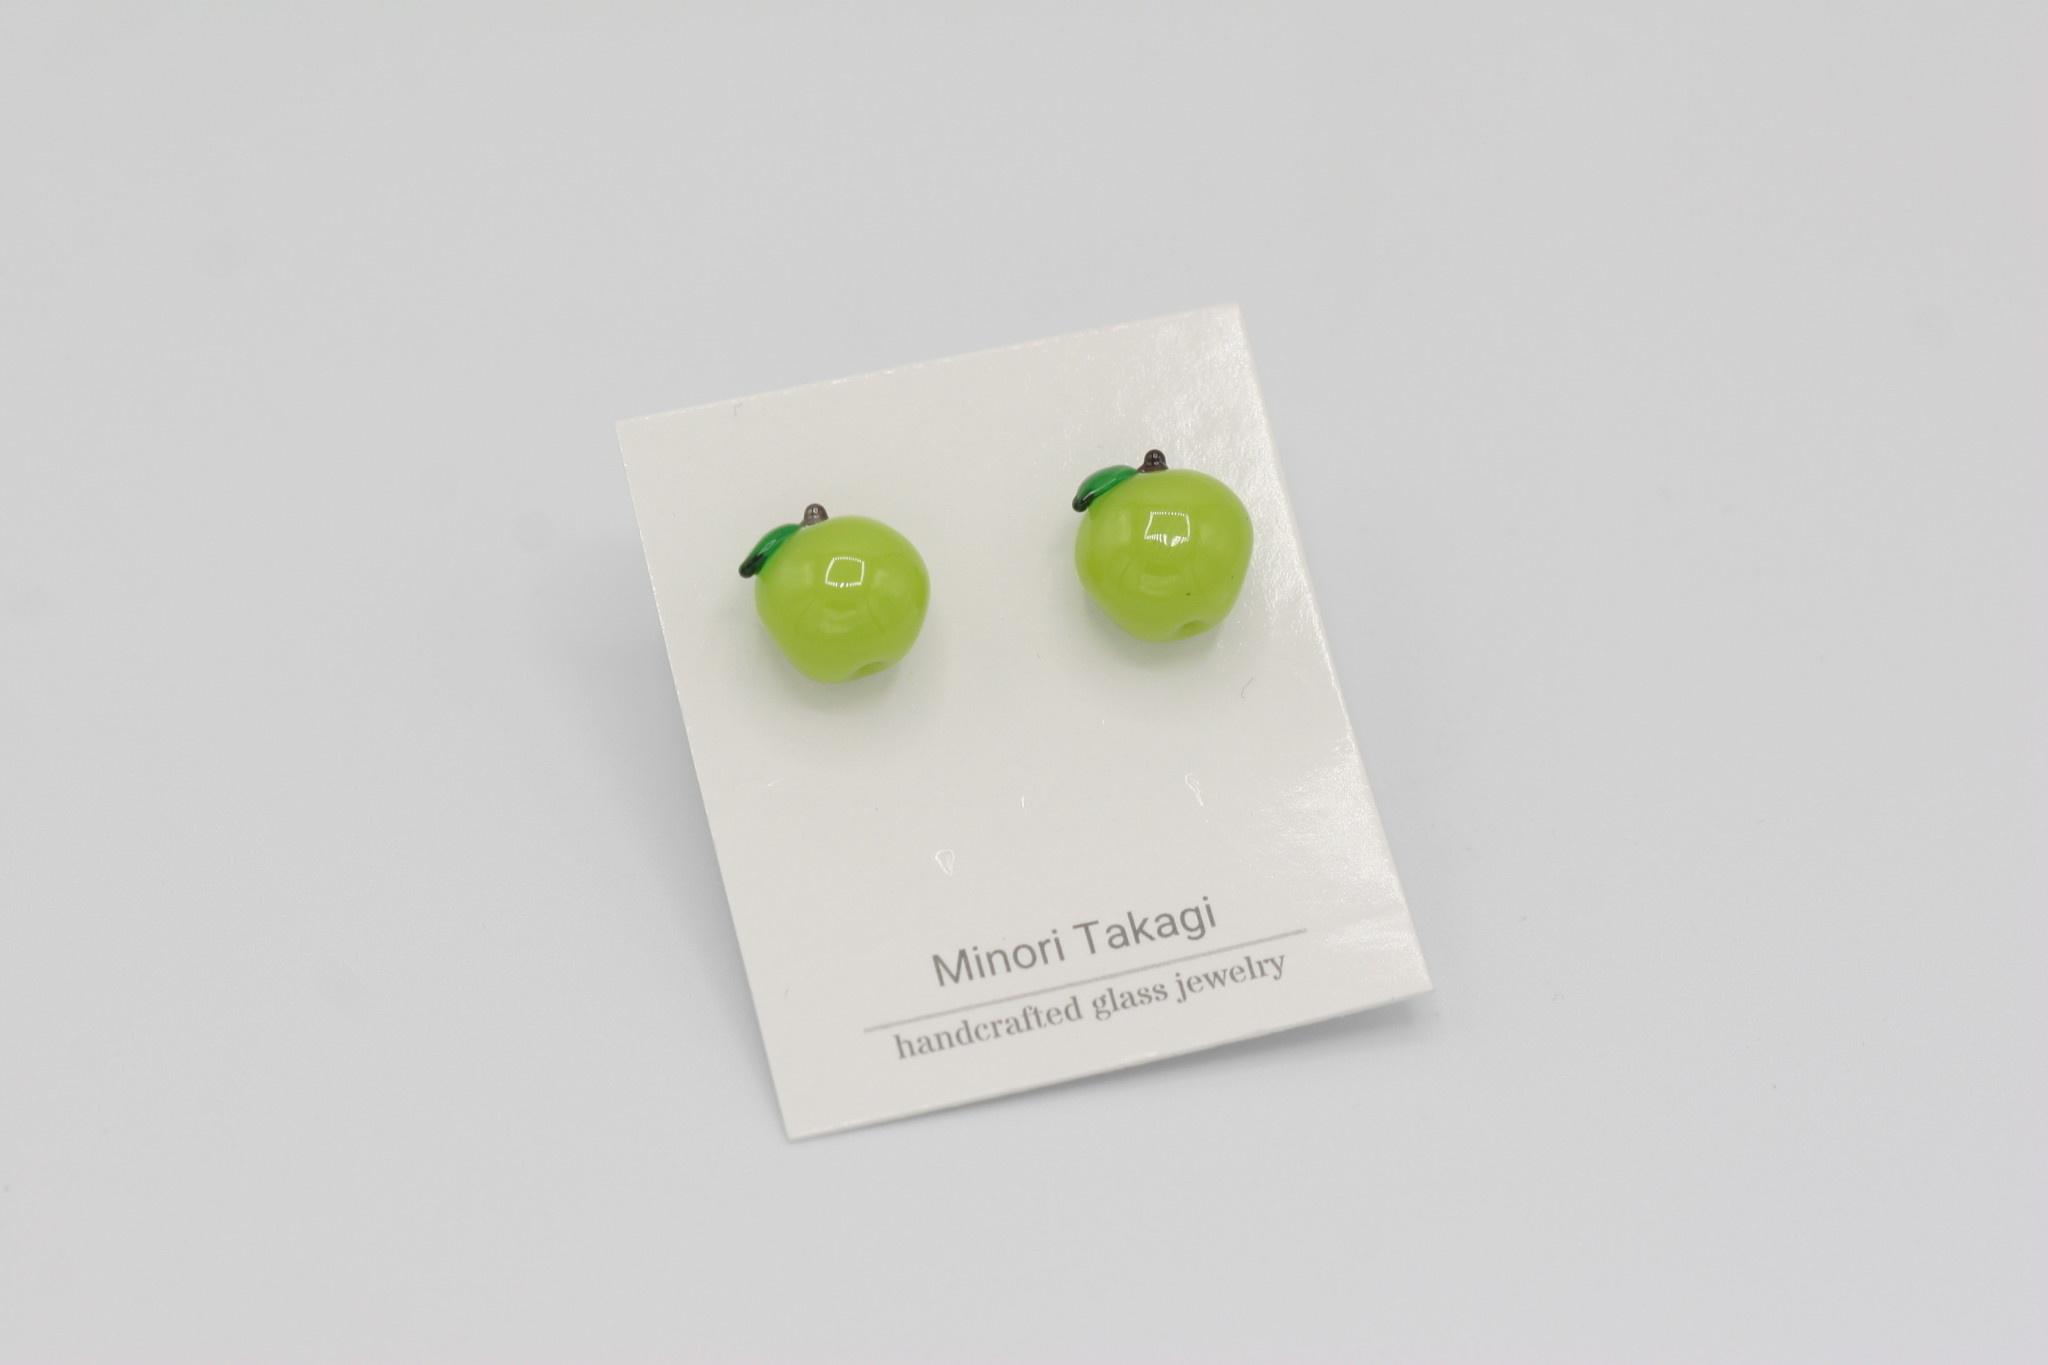 Minori Takagi Earrings - Green Apple